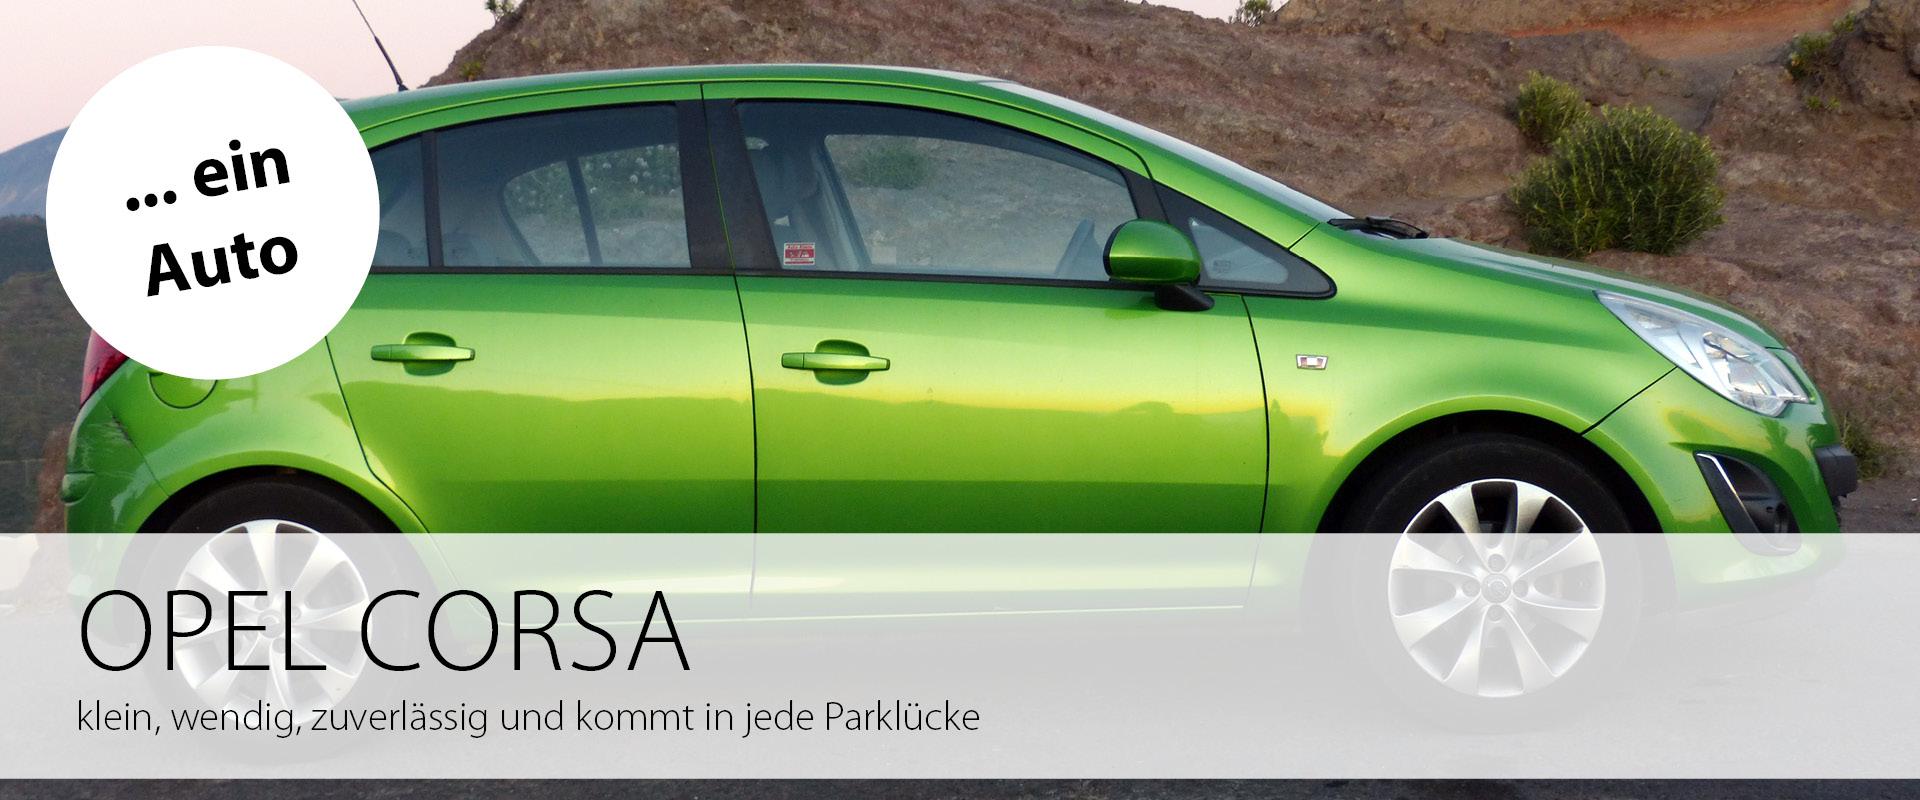 Ein Auto: Opel Corsa